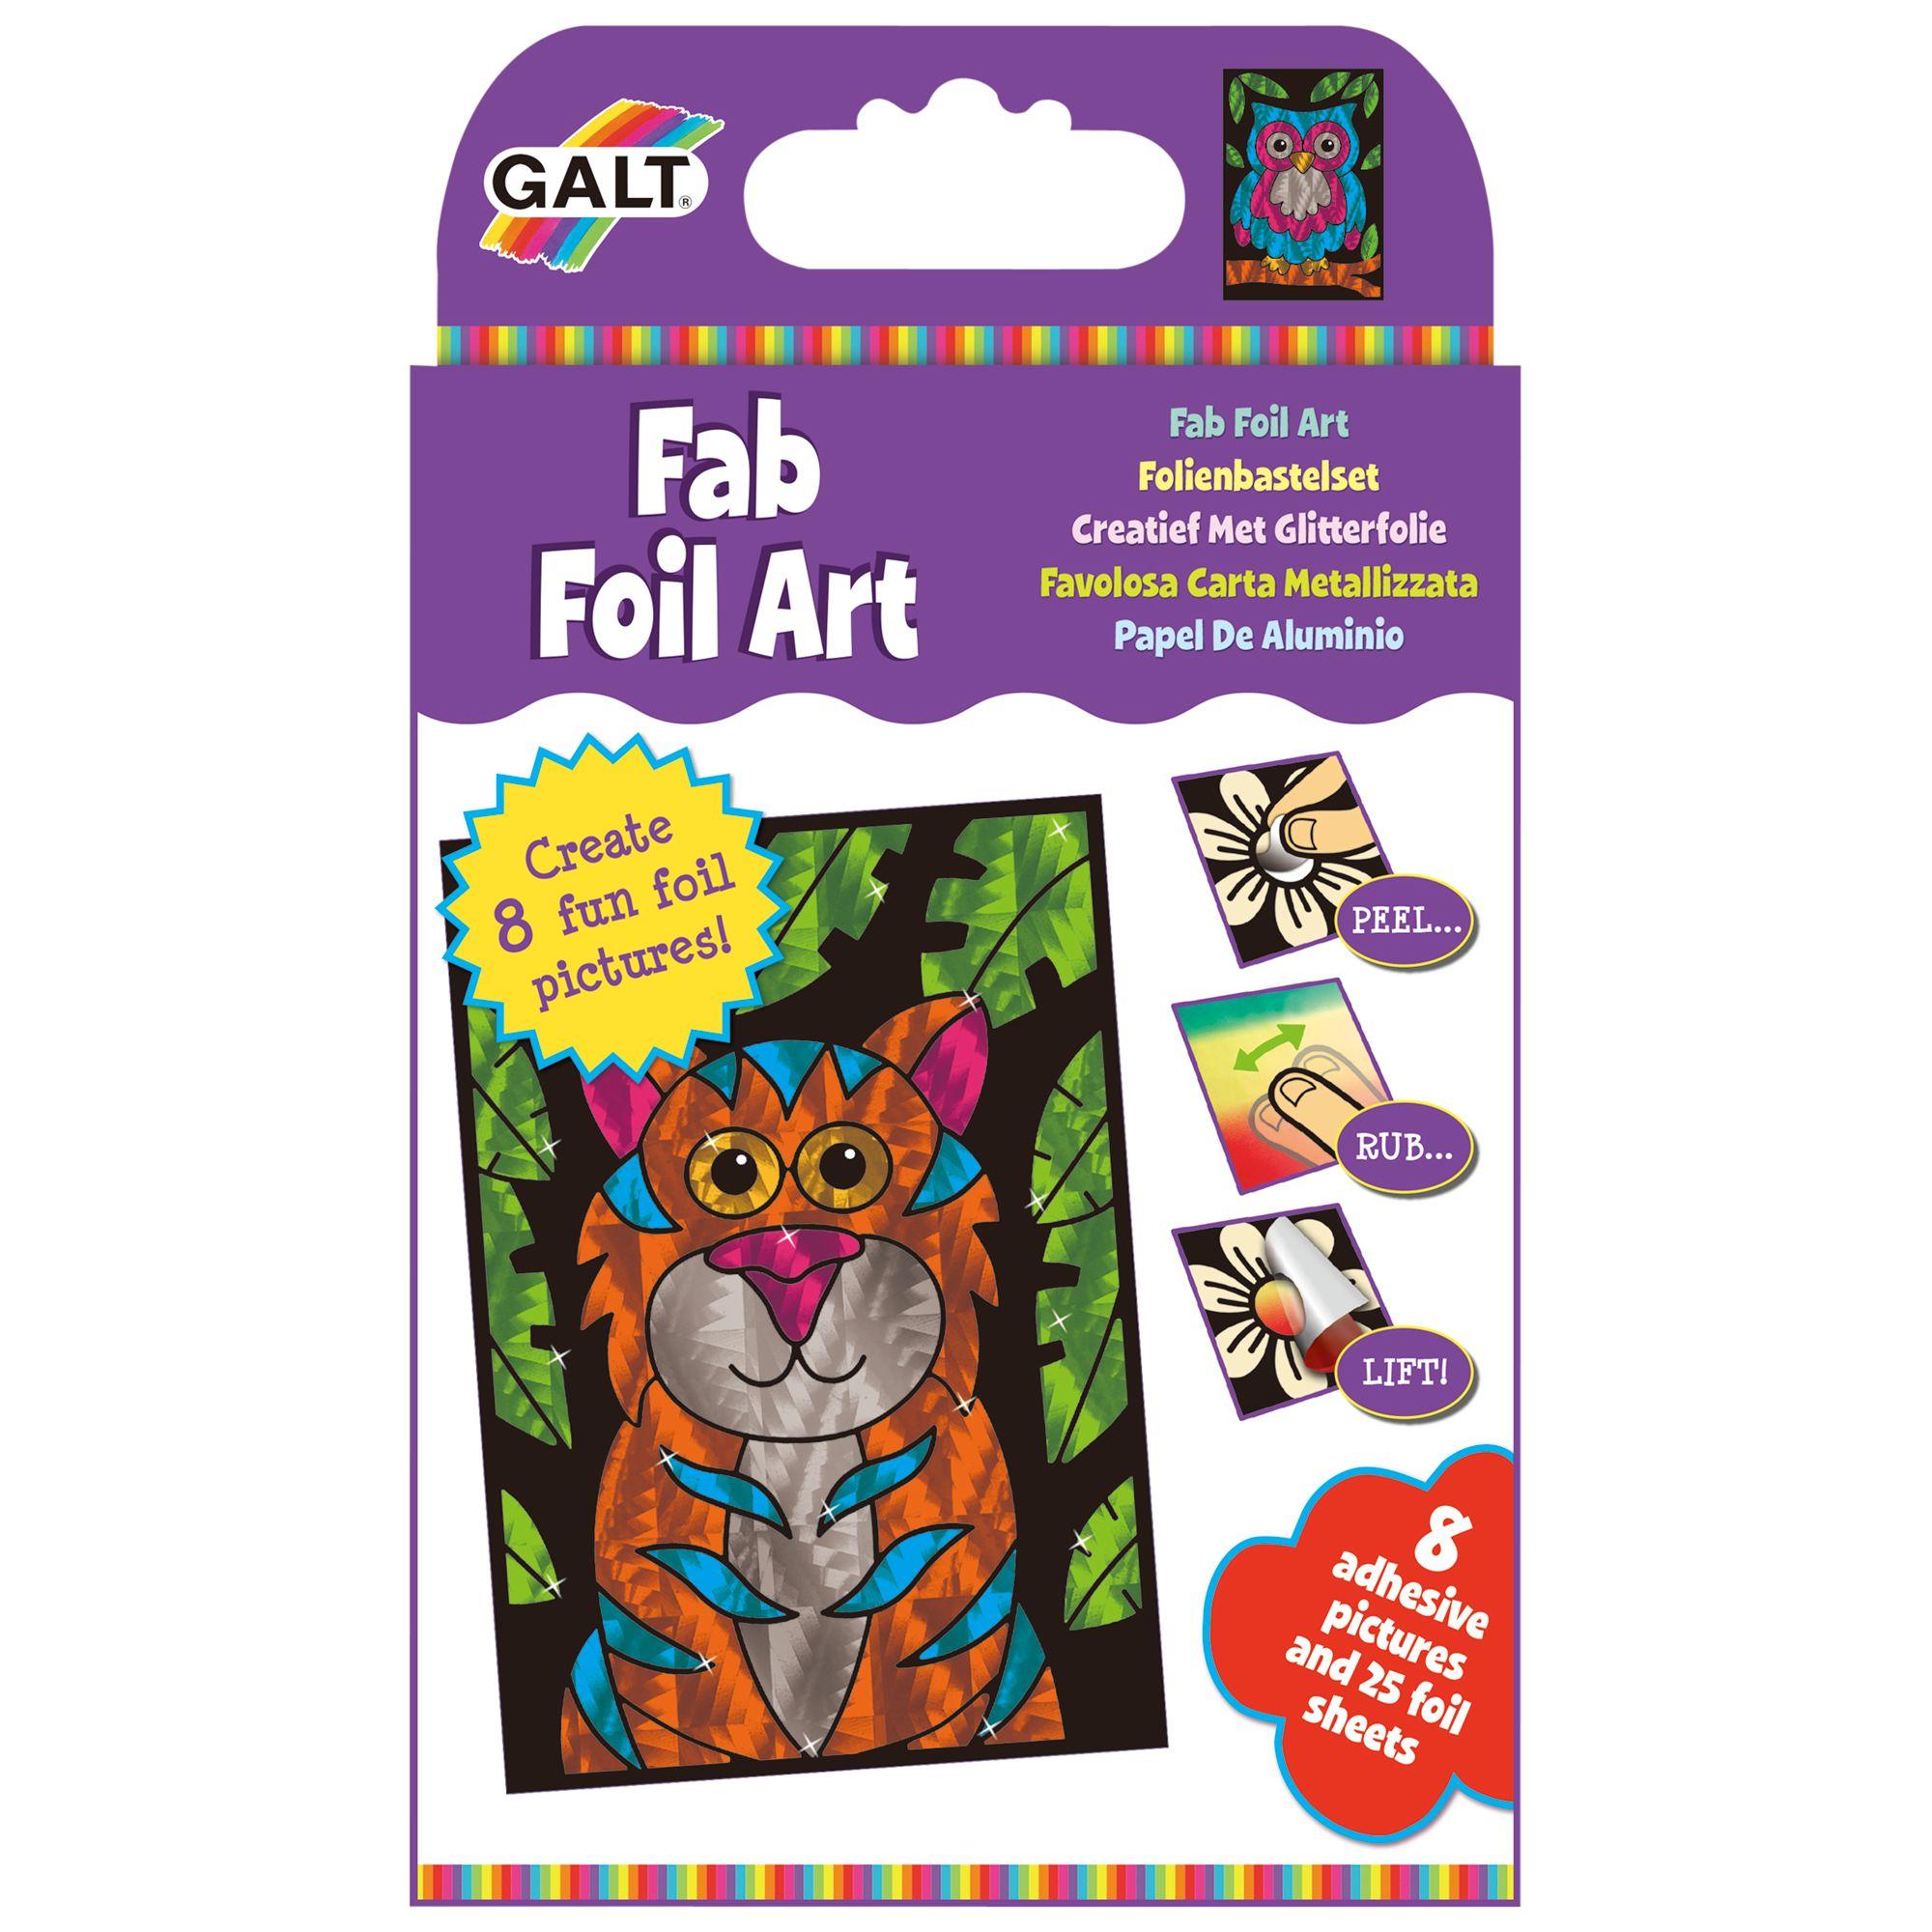 Galt Galt Fab Foil Art